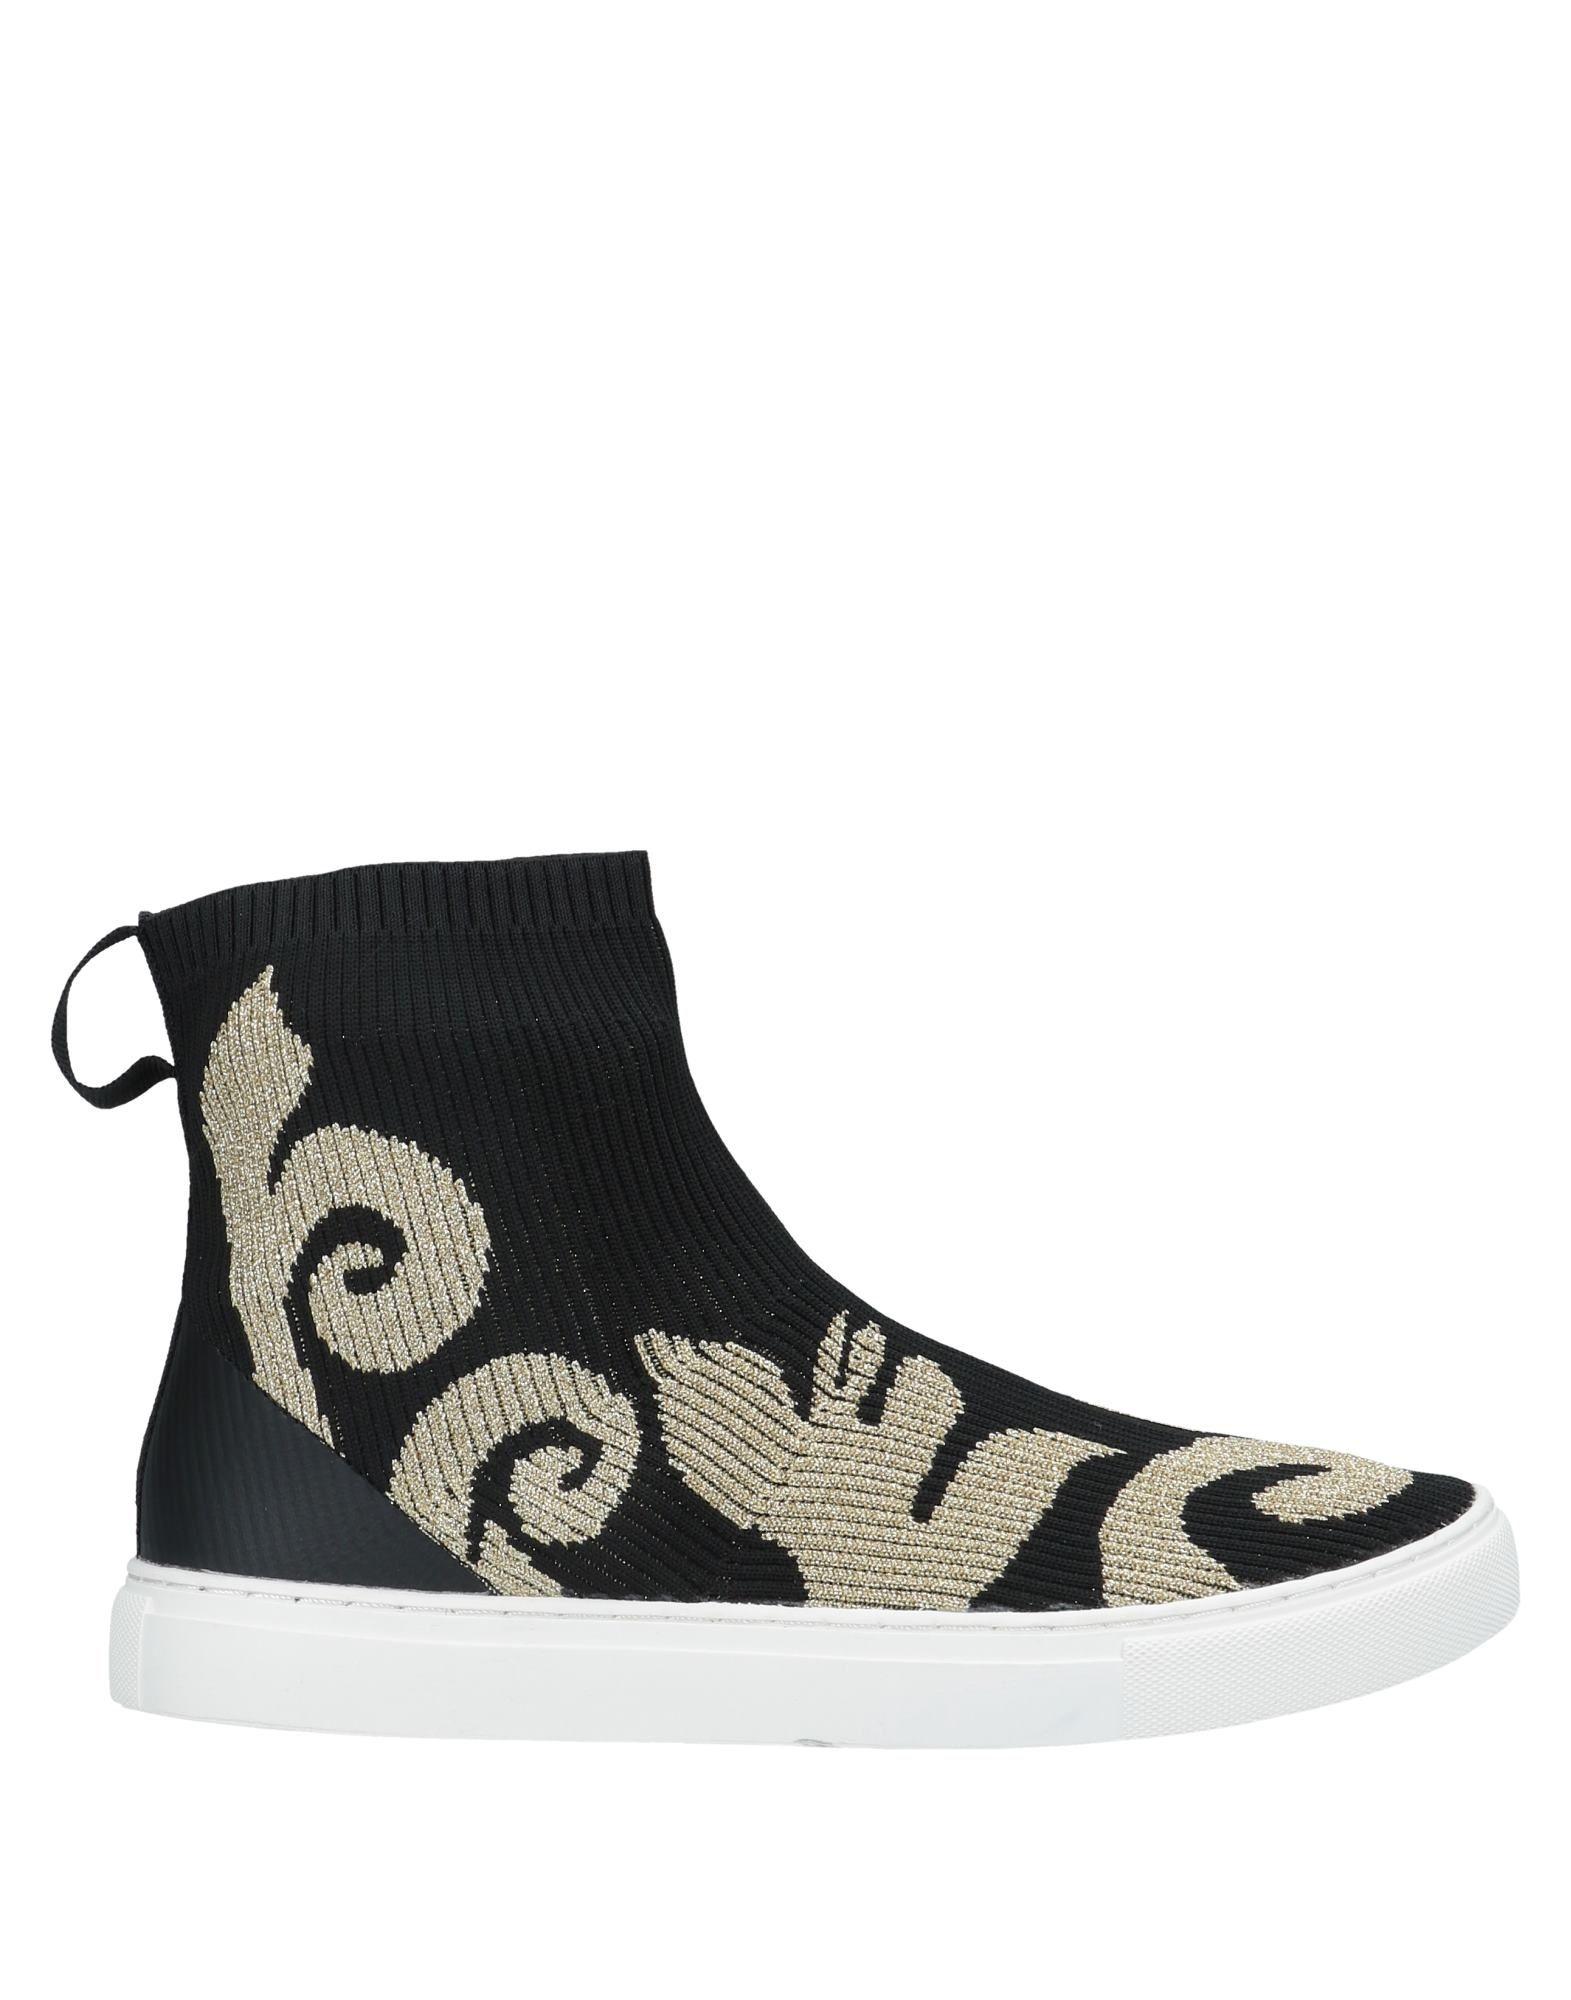 Malìparmi Sneakers - Women Malìparmi Sneakers - online on  Australia - Sneakers 11558807BU d562b4